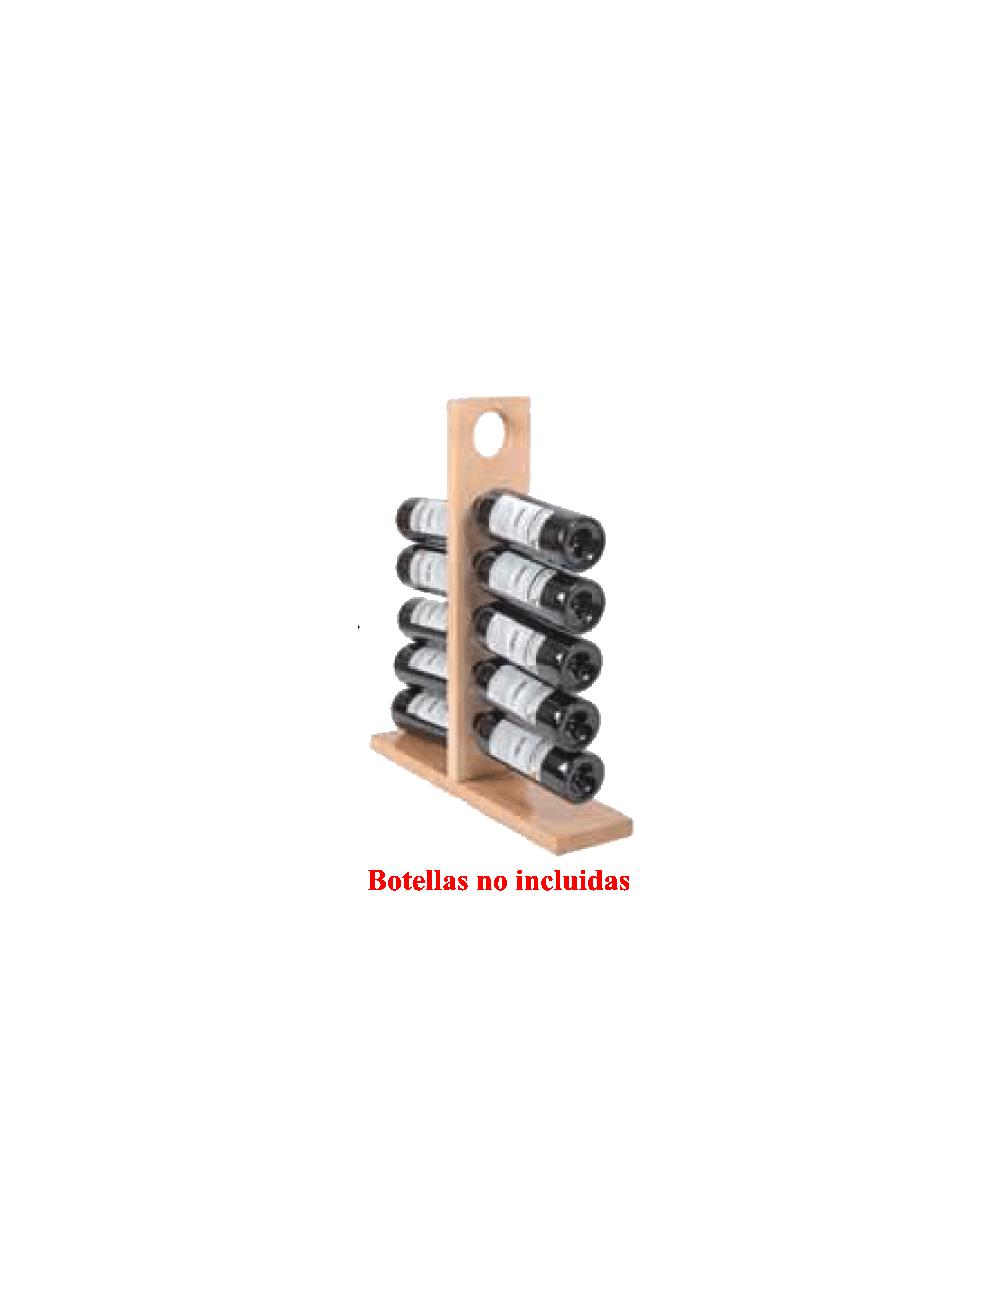 BOTELLERO MADERA DE HAYA Mod. CHINCHON-10 botellas